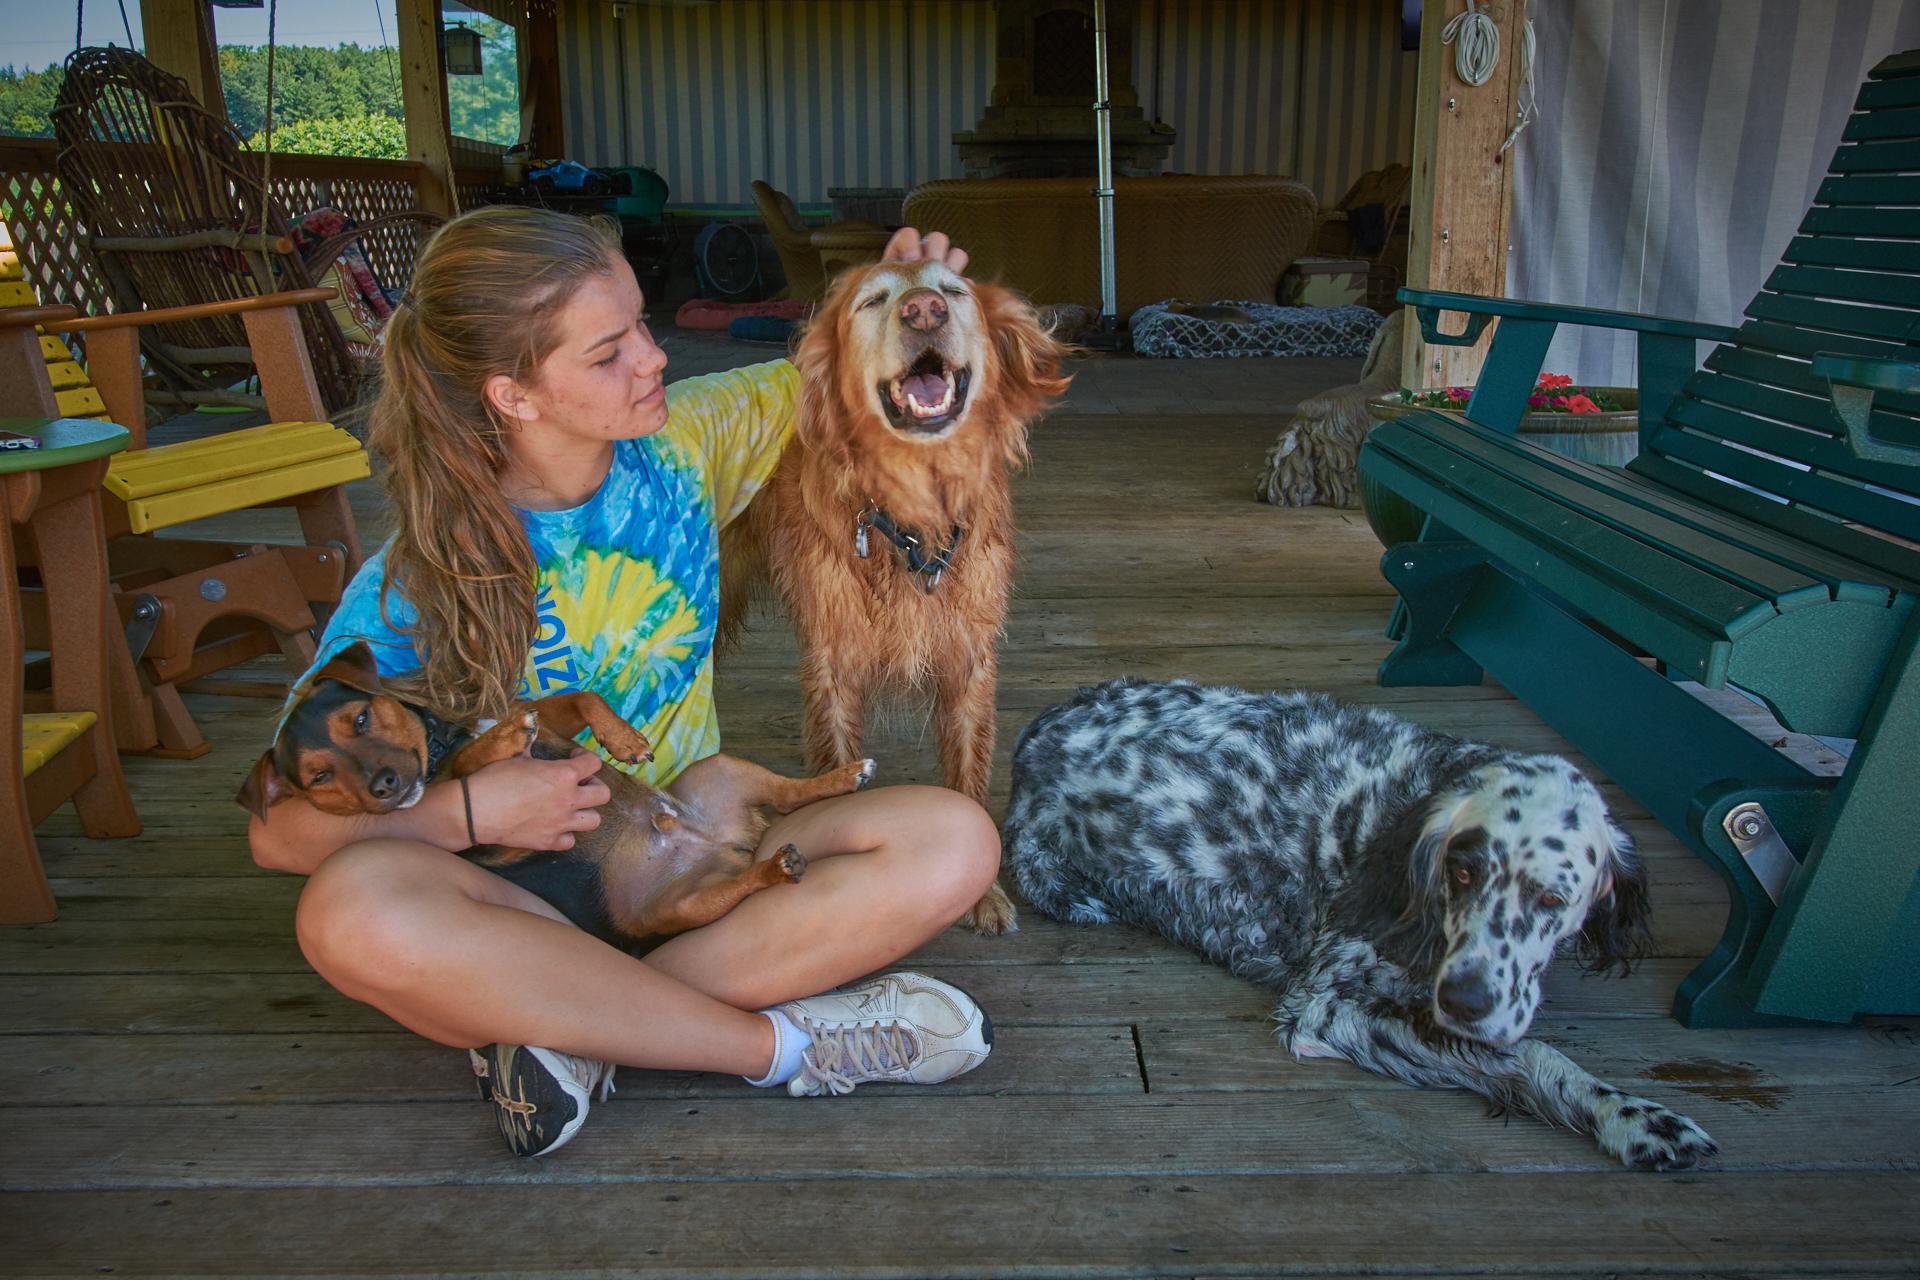 Smiling Dog At The Dogwoods Mount Horeb, WI